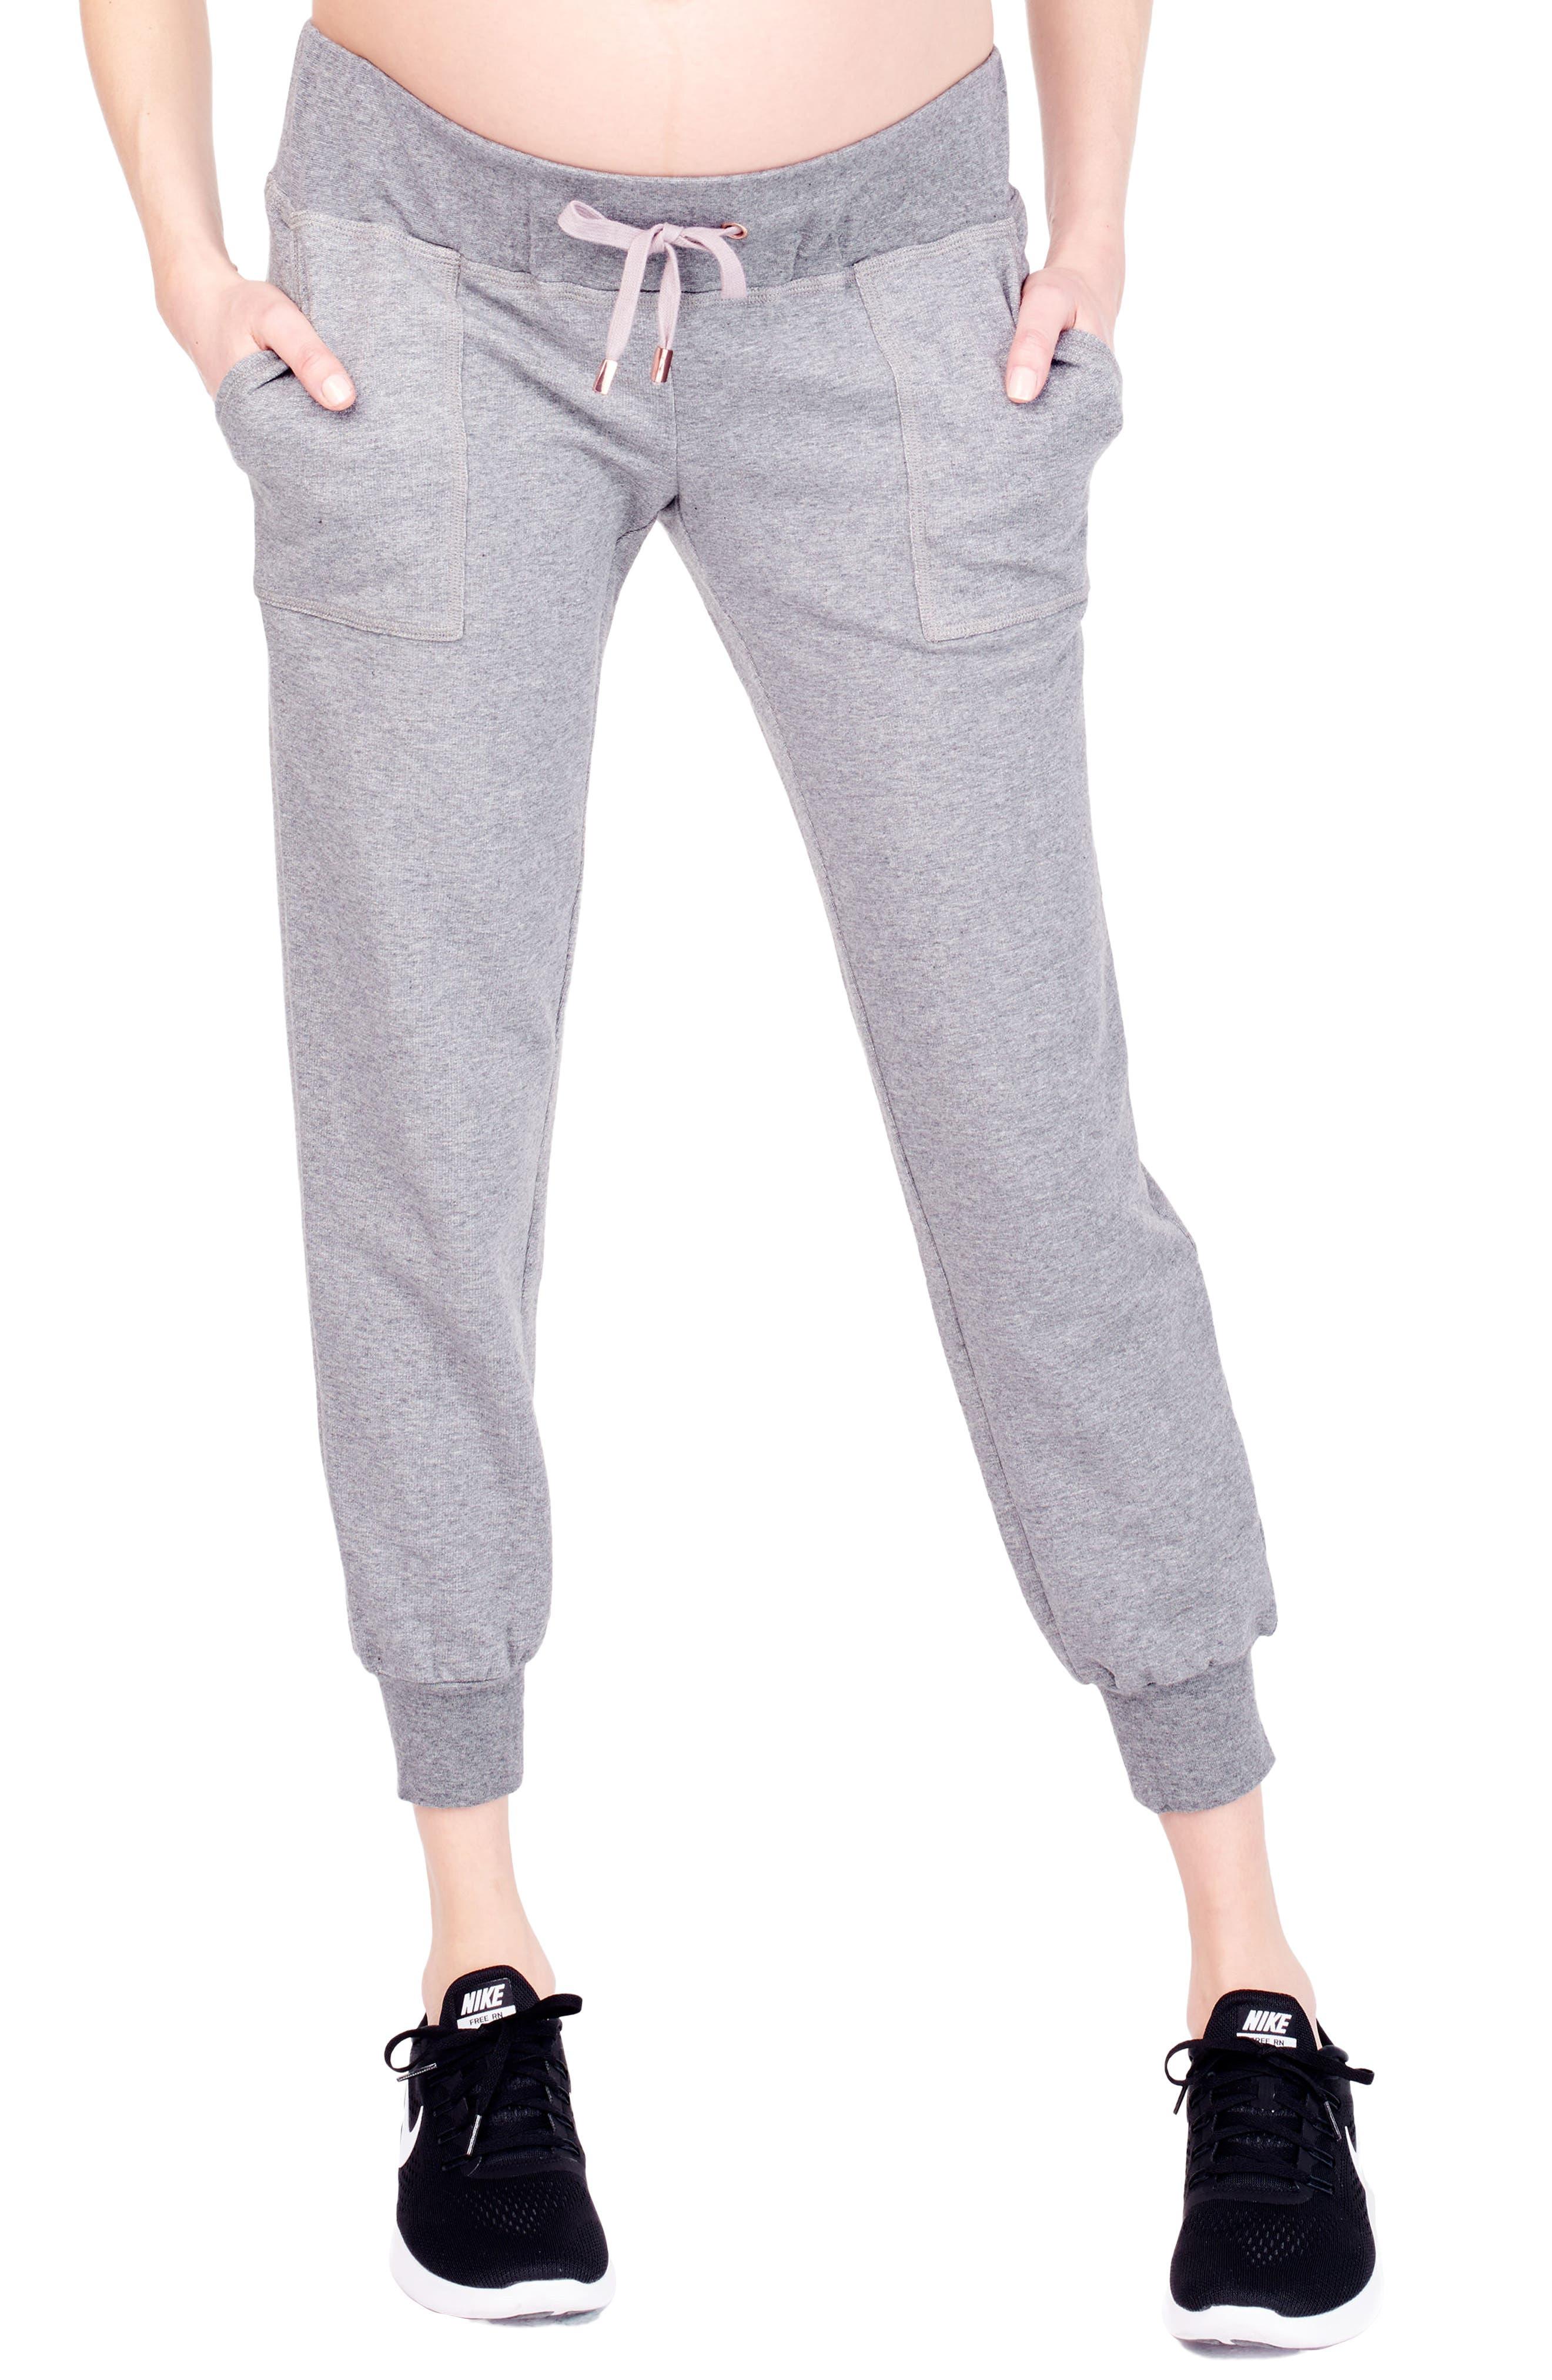 Main Image - Ingrid & Isabel® Cozy Fleece Maternity Jogger Pants